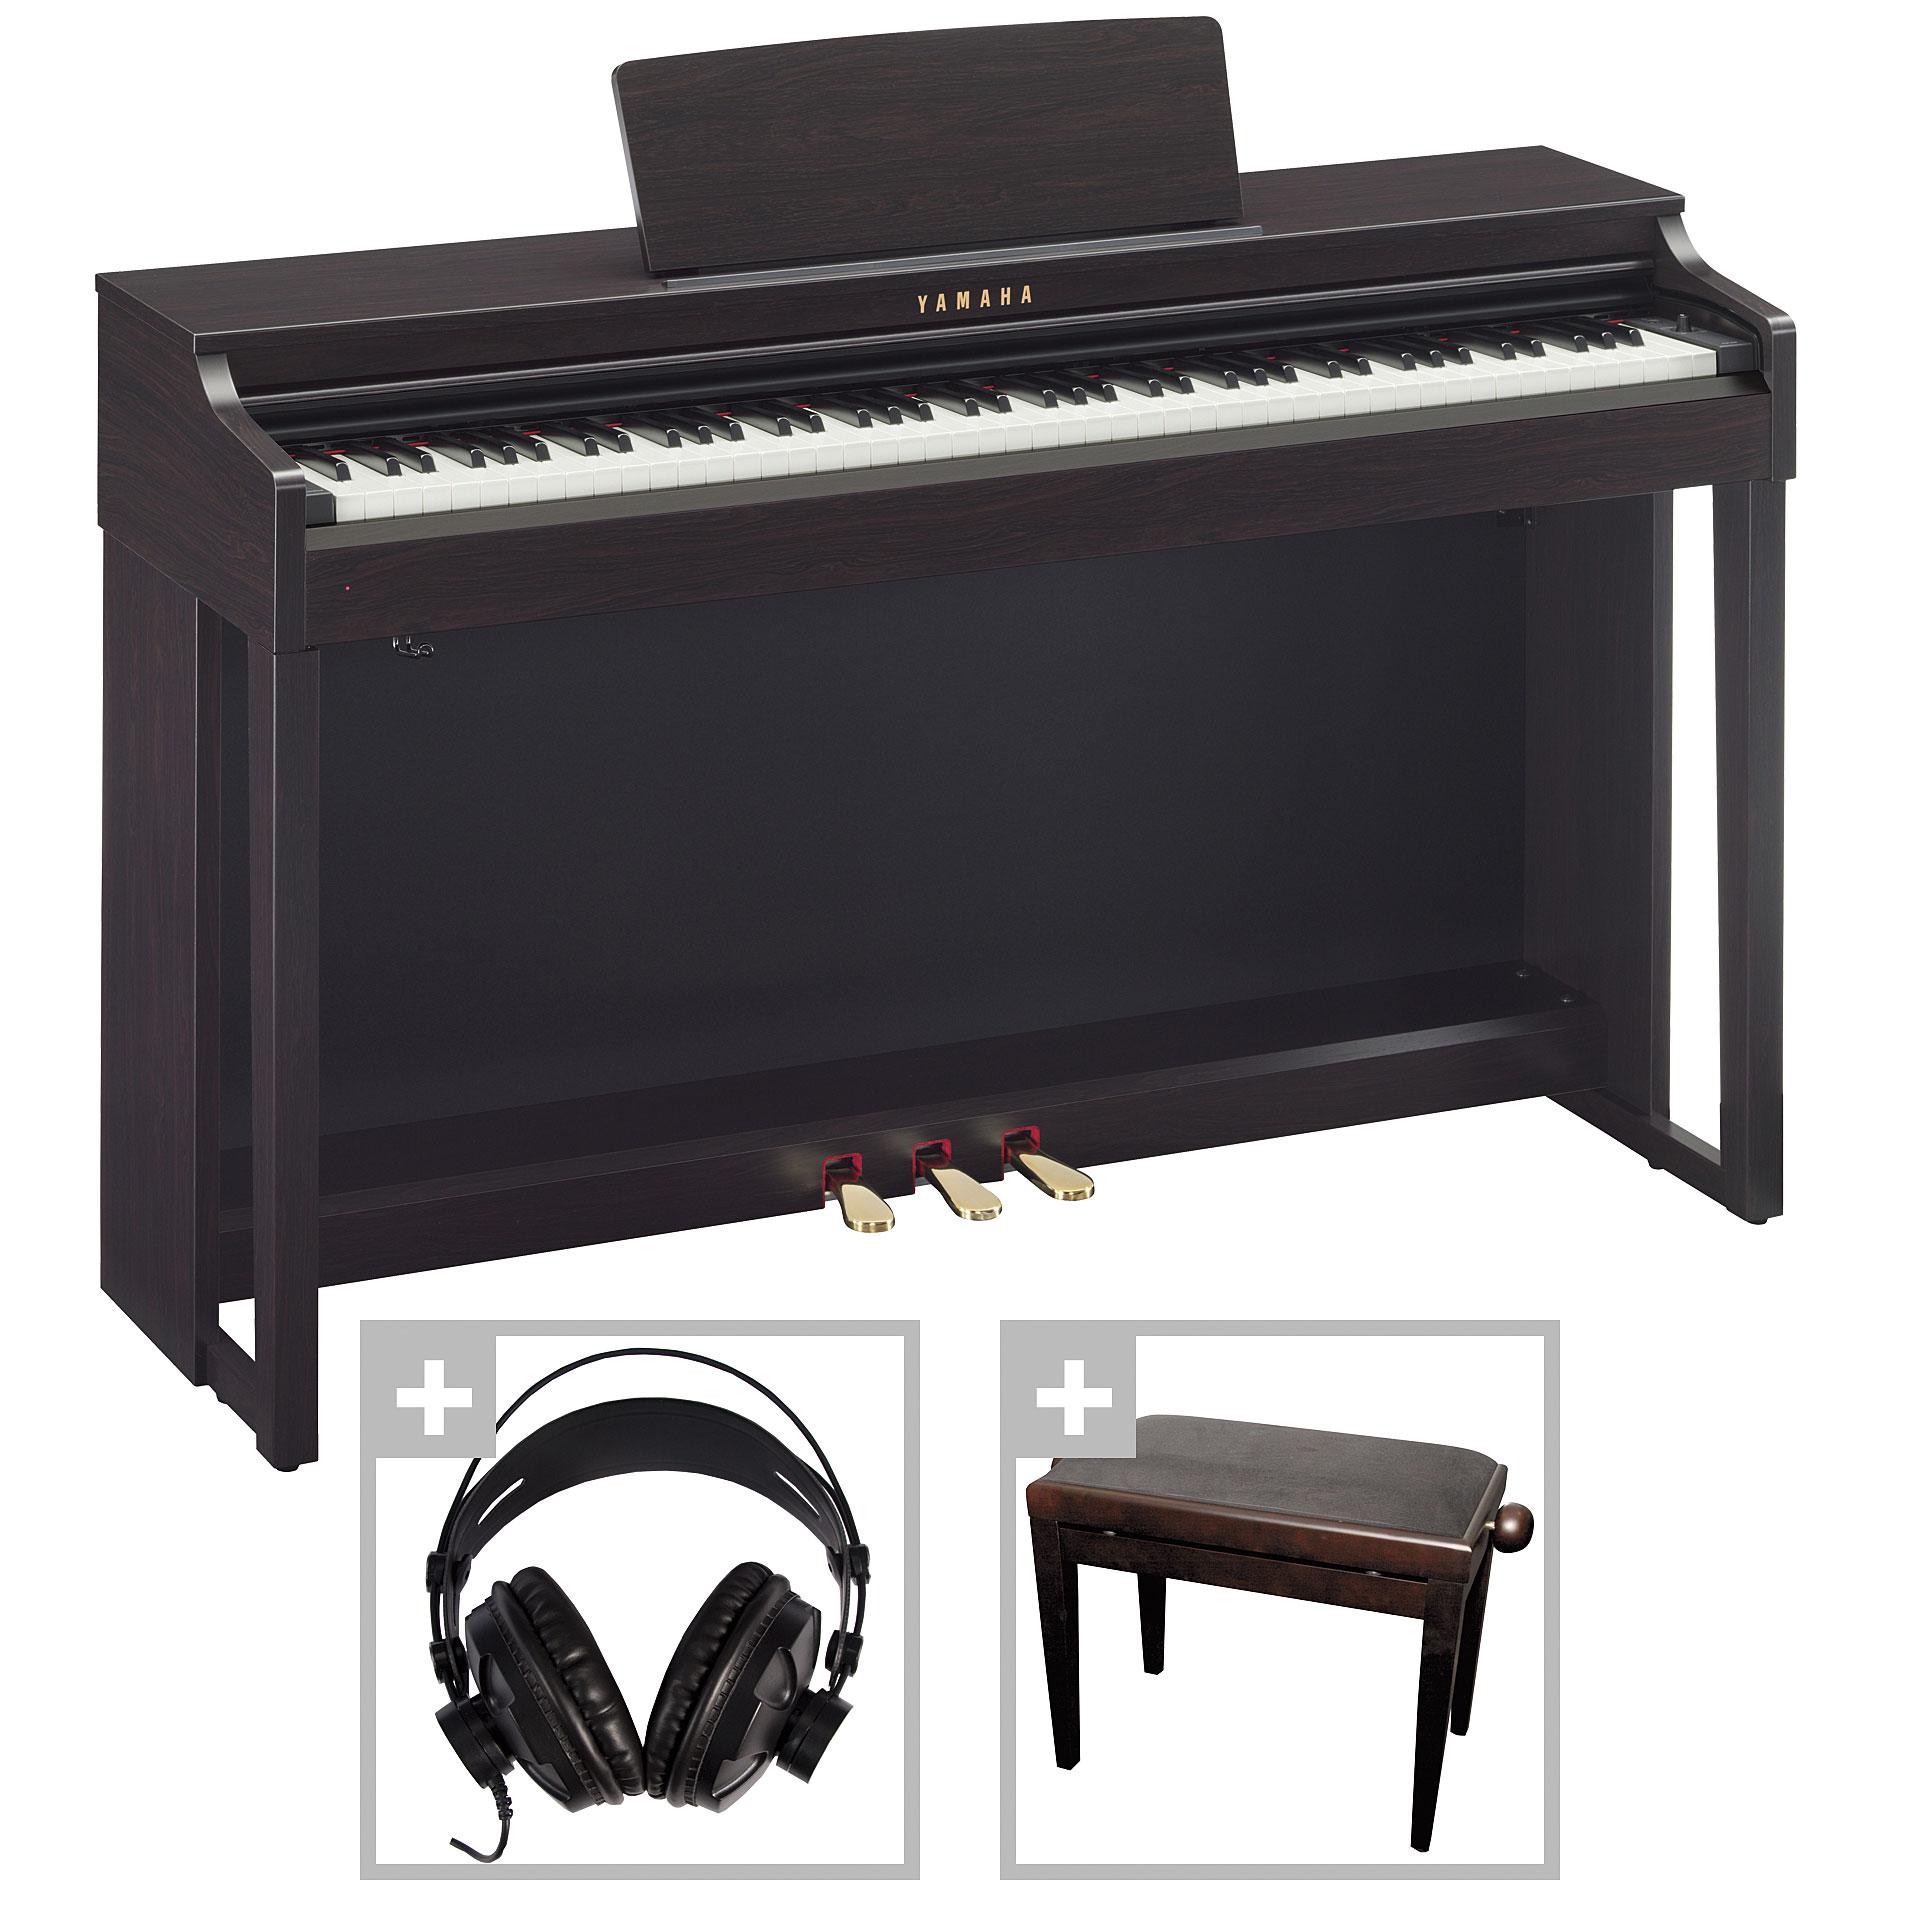 Yamaha clavinova clp 525r bundle digital piano for Yamaha digital piano clavinova